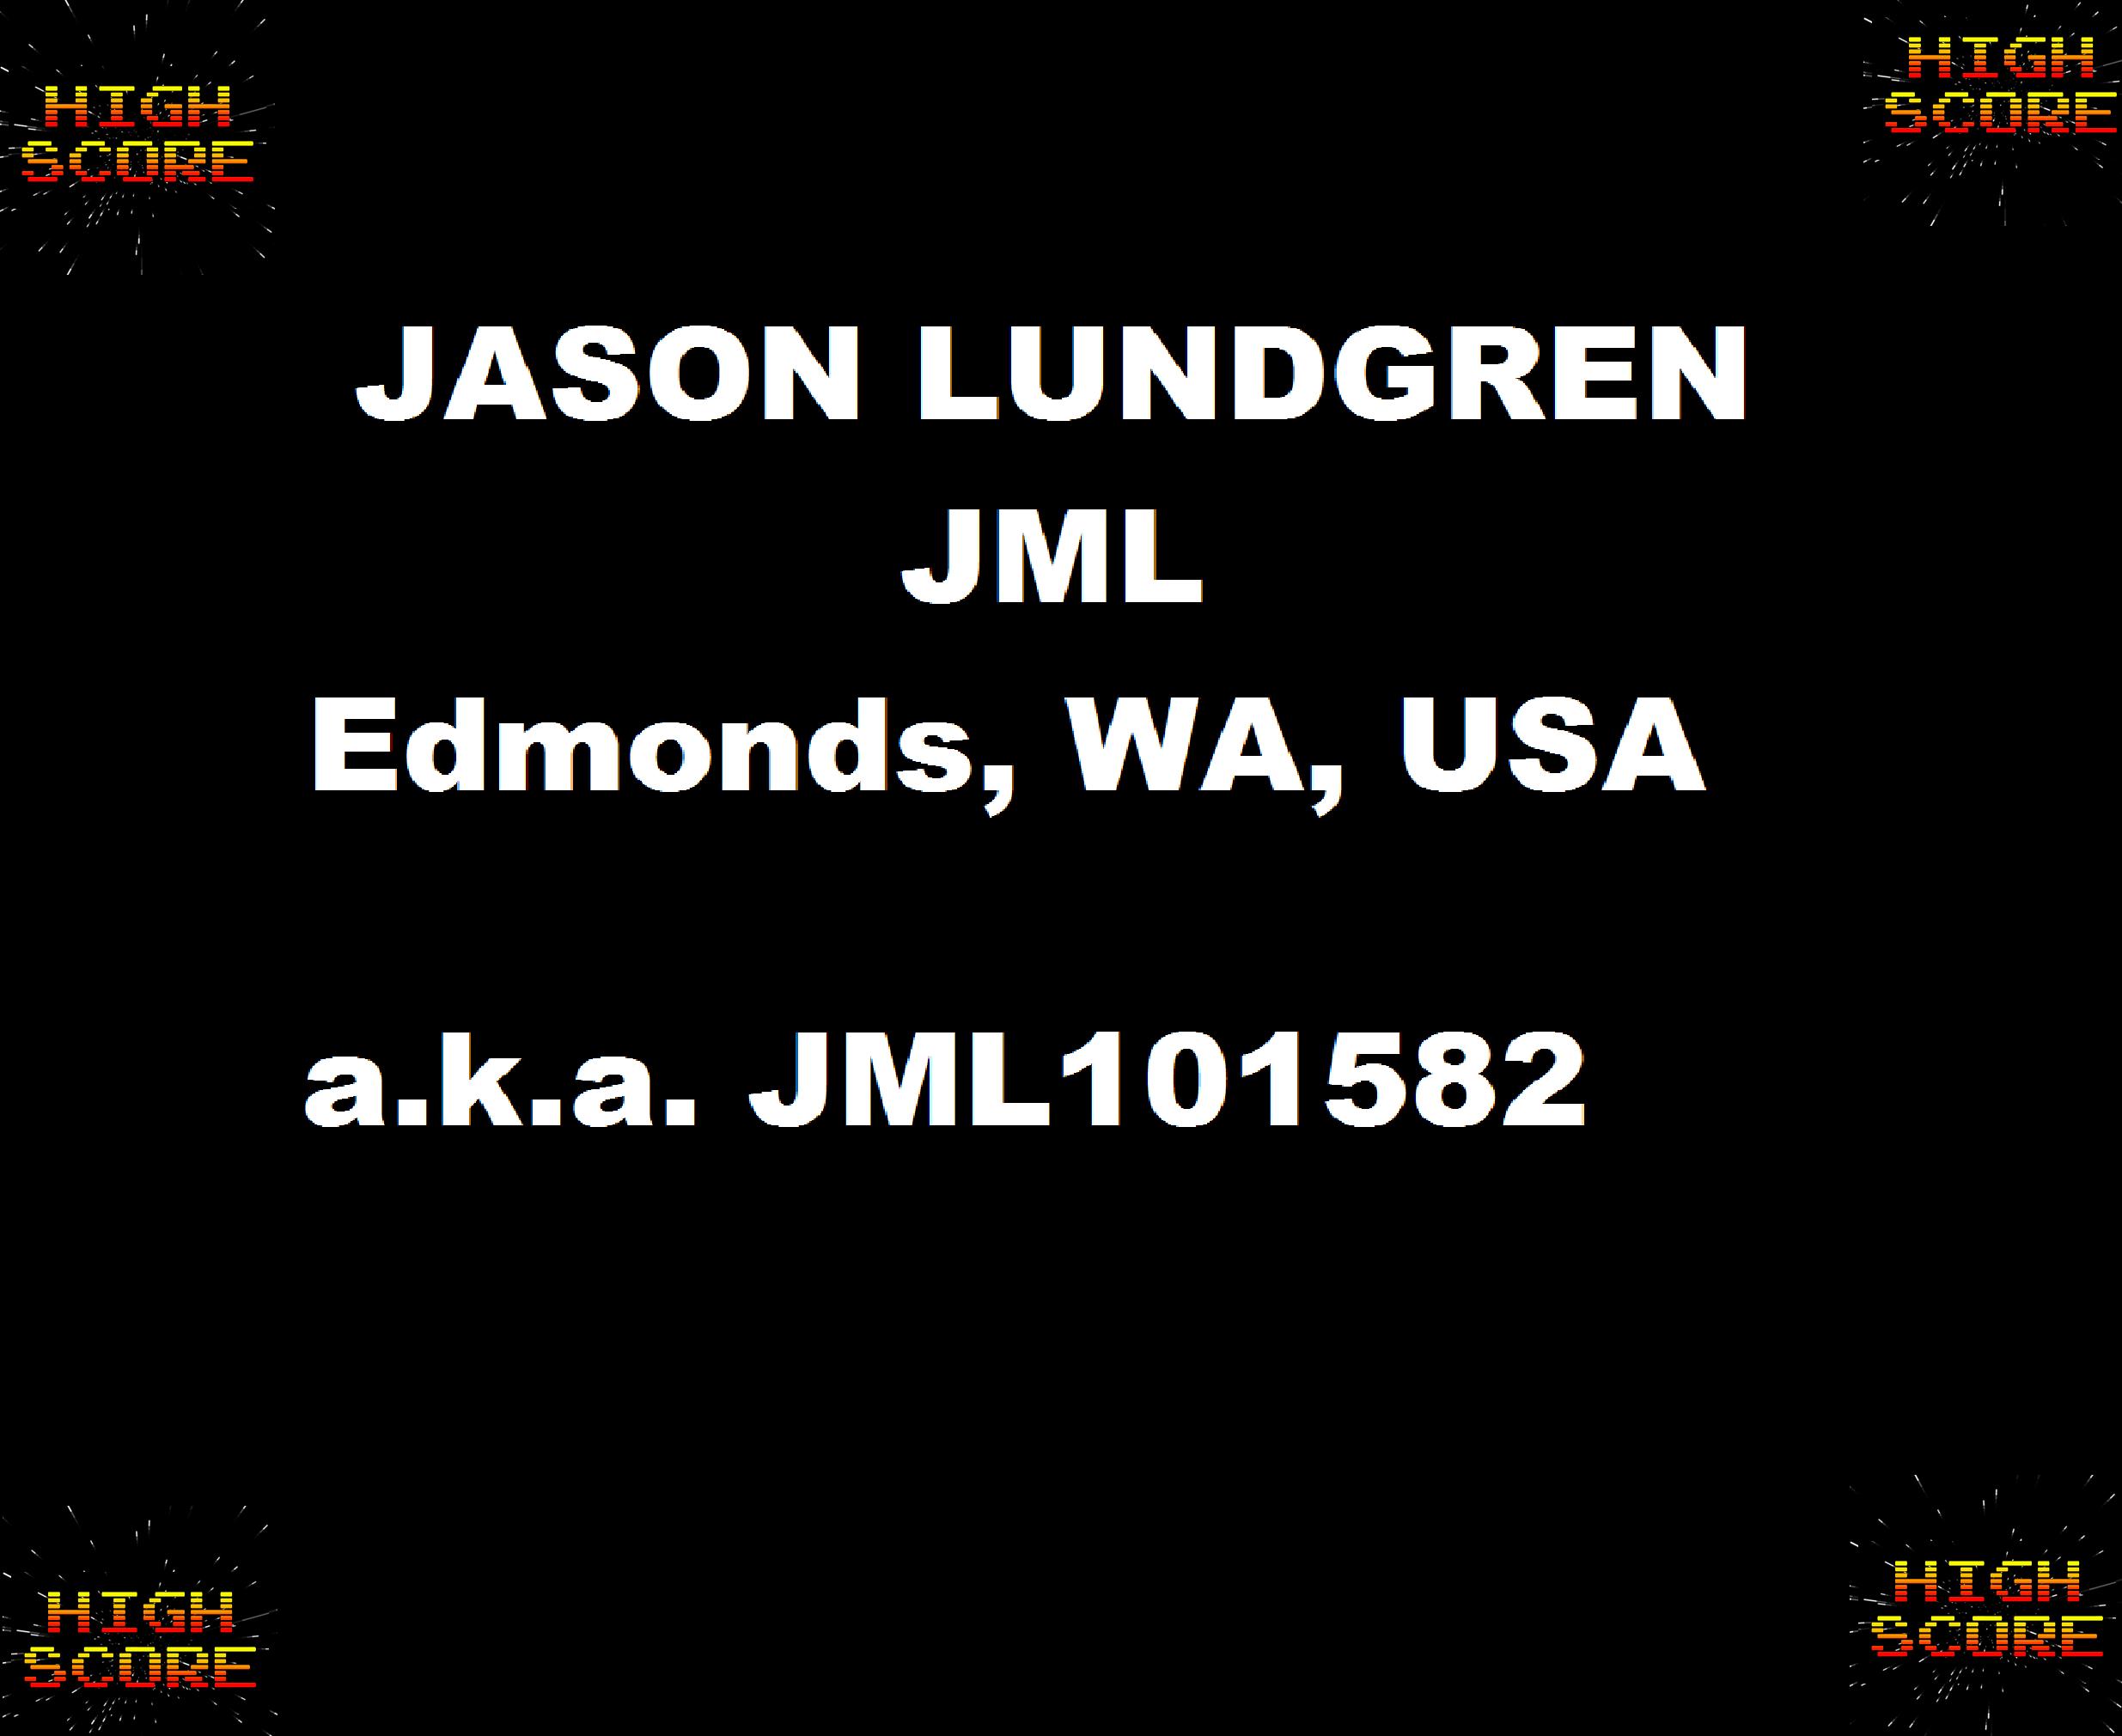 JML101582: Batman [Hard] (Sega Genesis / MegaDrive Emulated) 3,500 points on 2019-06-21 20:24:21